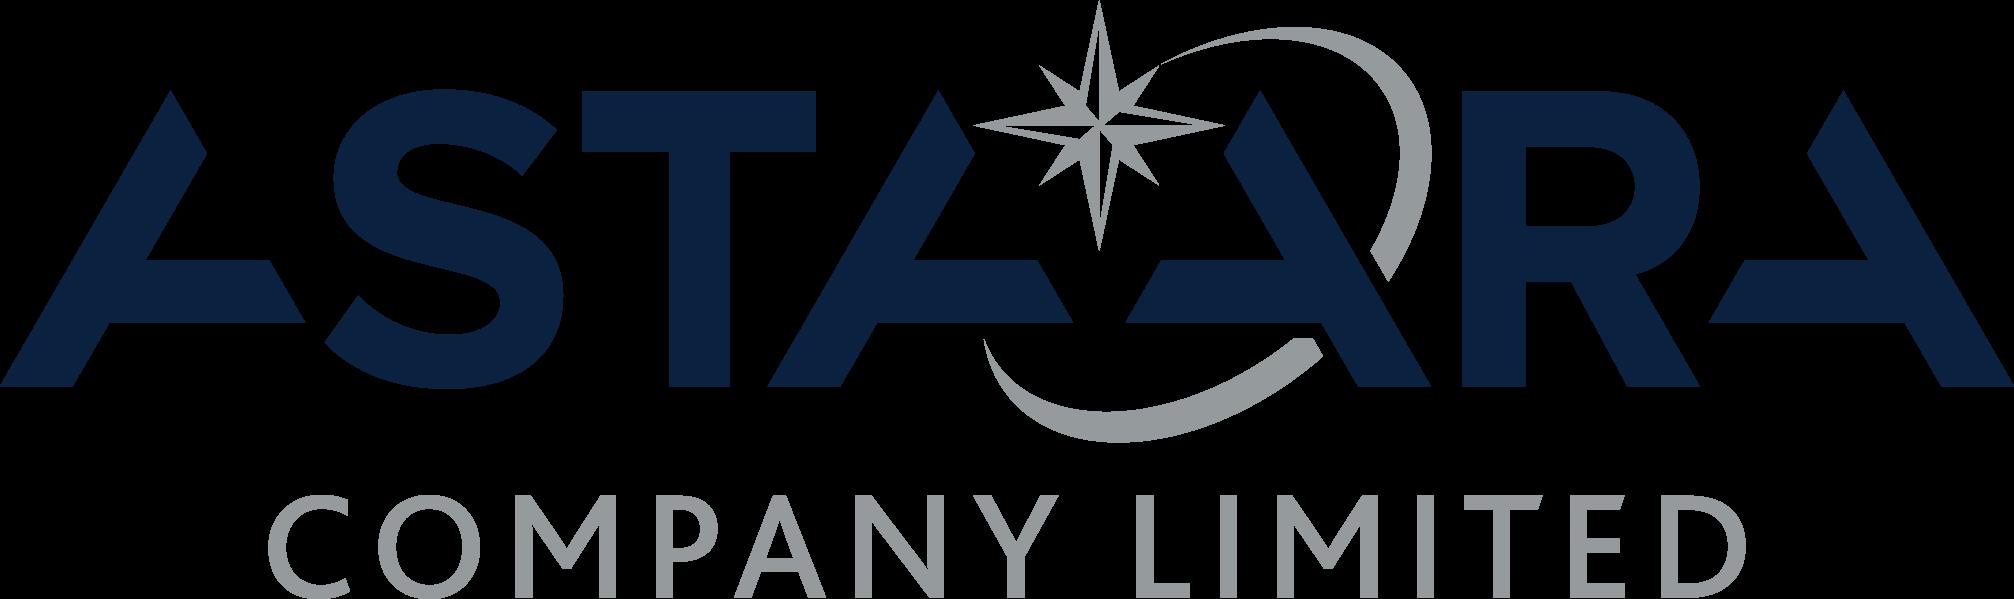 Astaara-Company-Limited-Logo-(RGB)